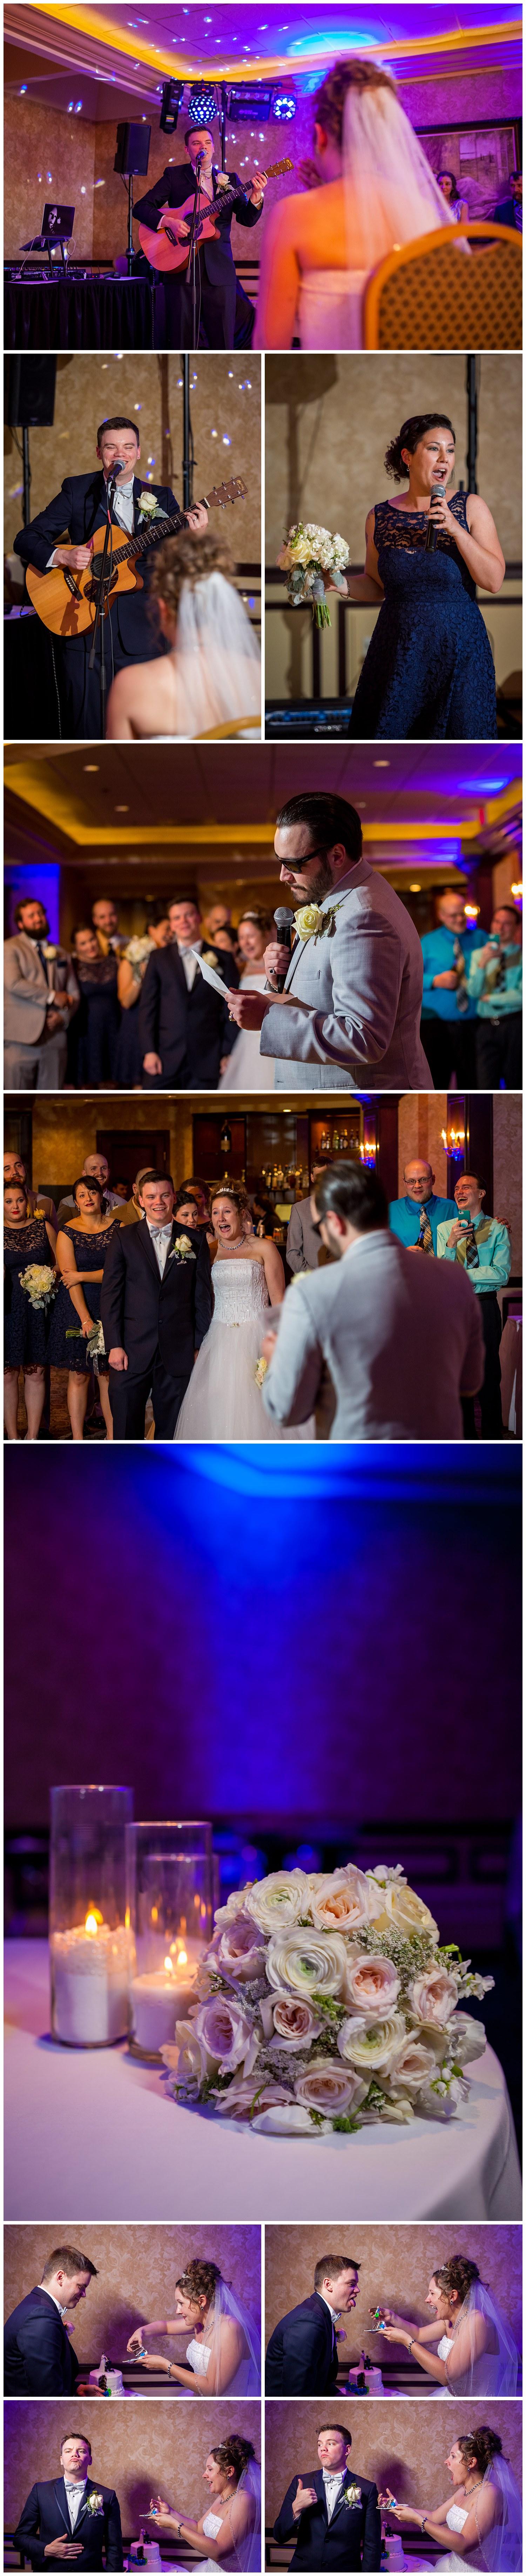 adam-waz-wedding-photographer-north kingstown-ri_0012.jpg